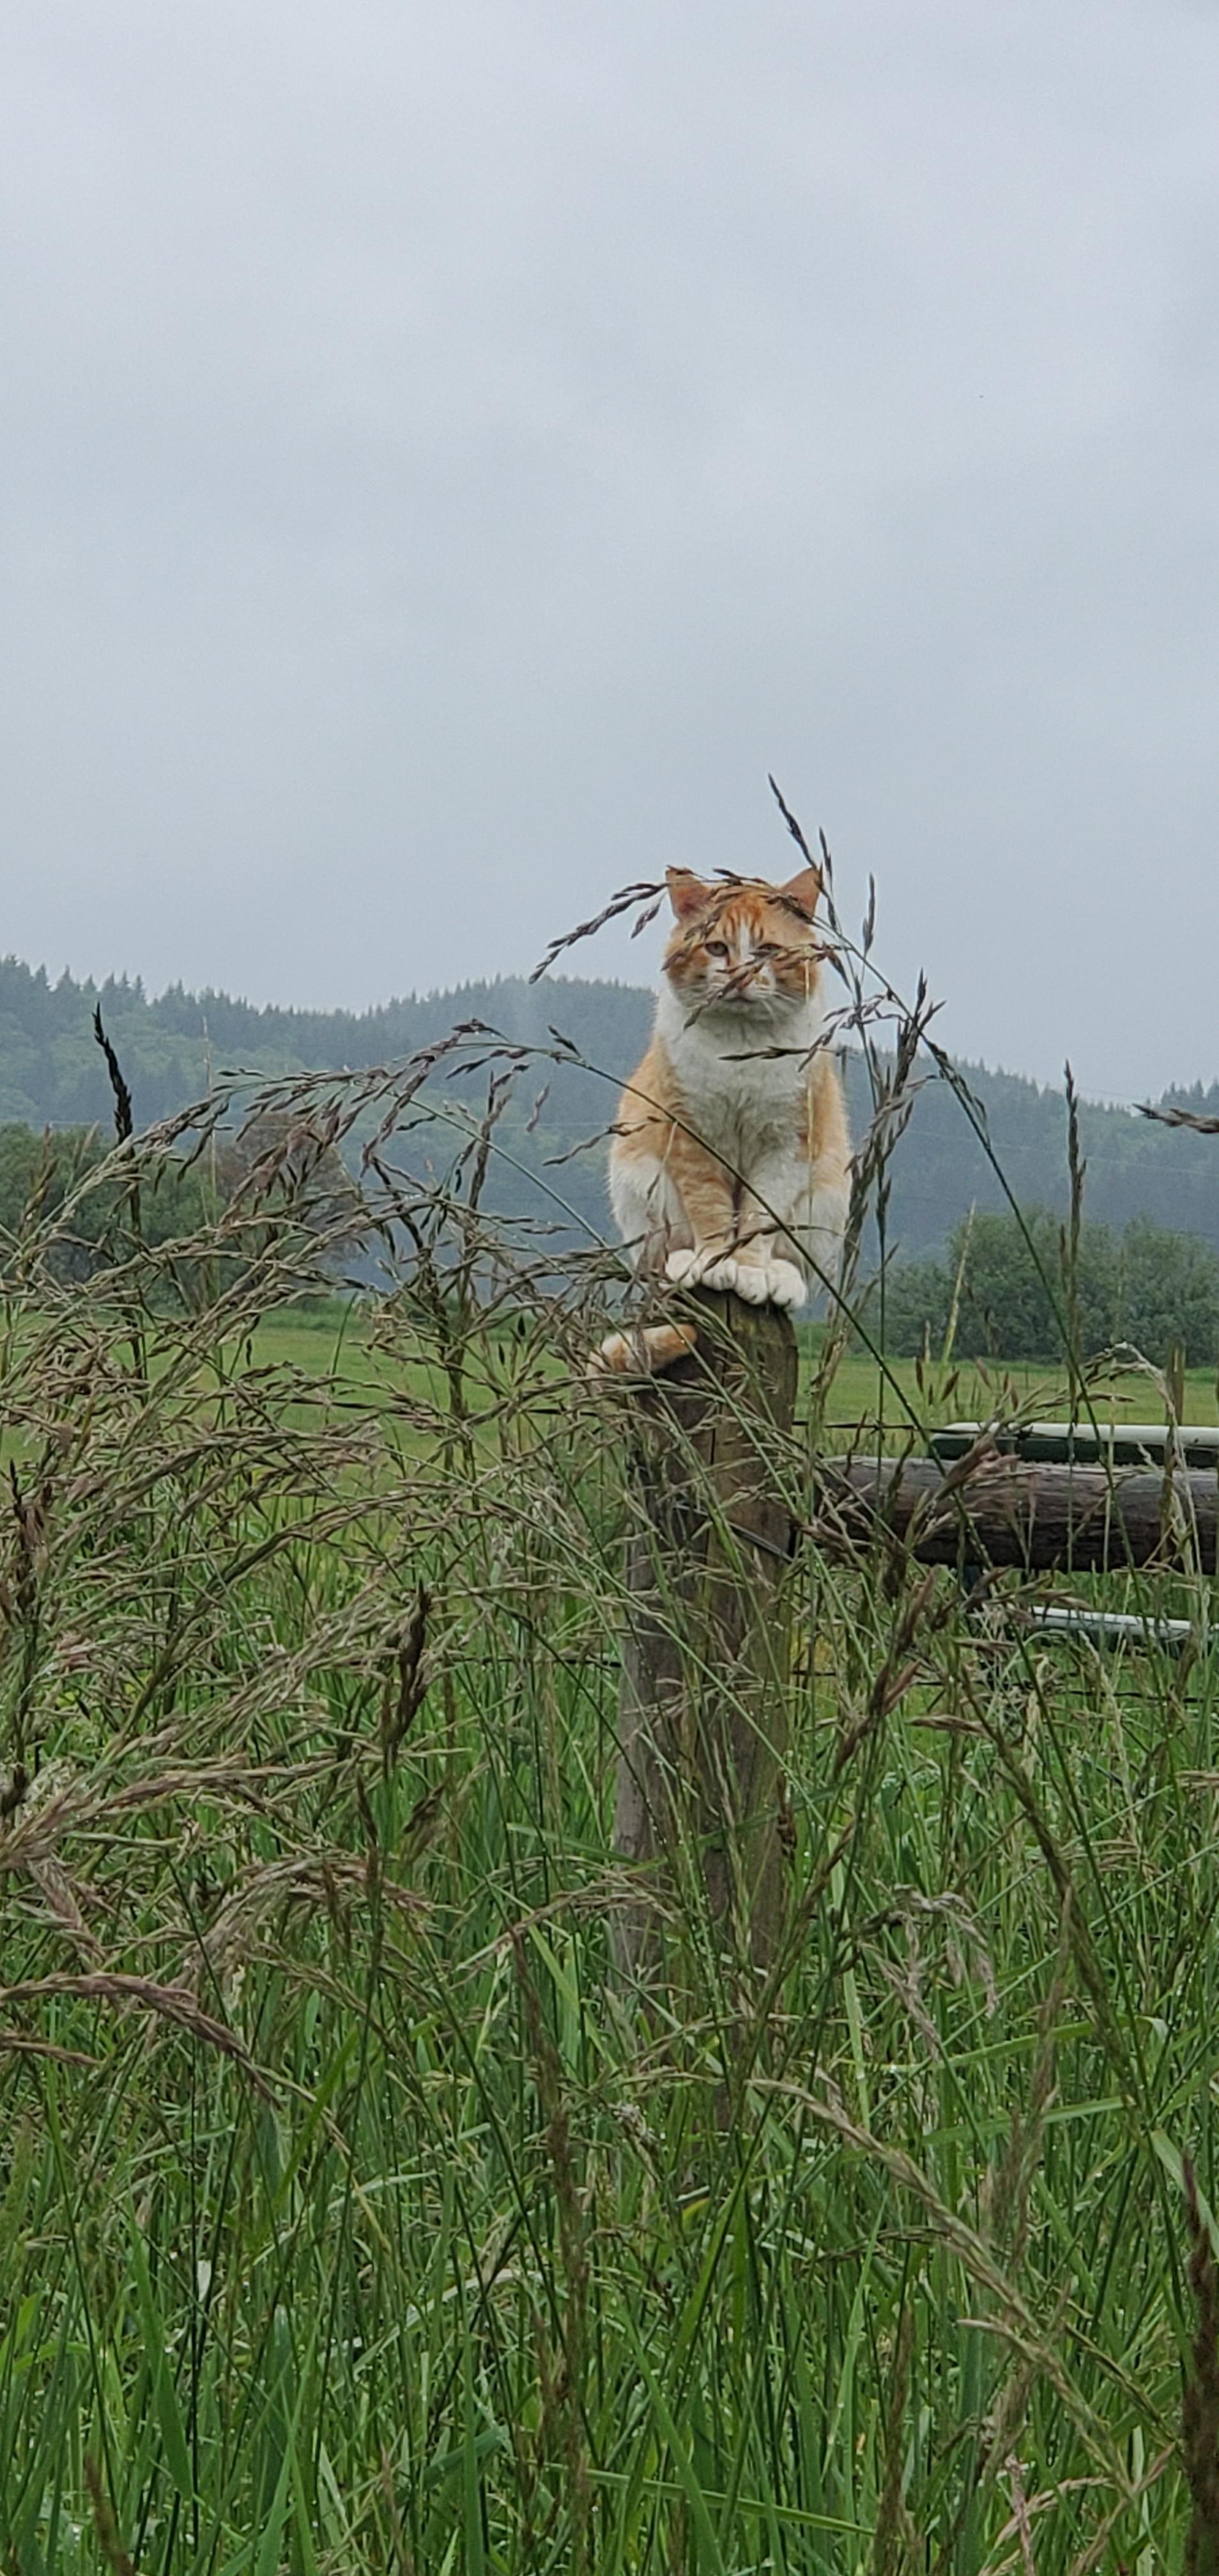 A feral/farm cat I see on my walks. I named him Post Malone.